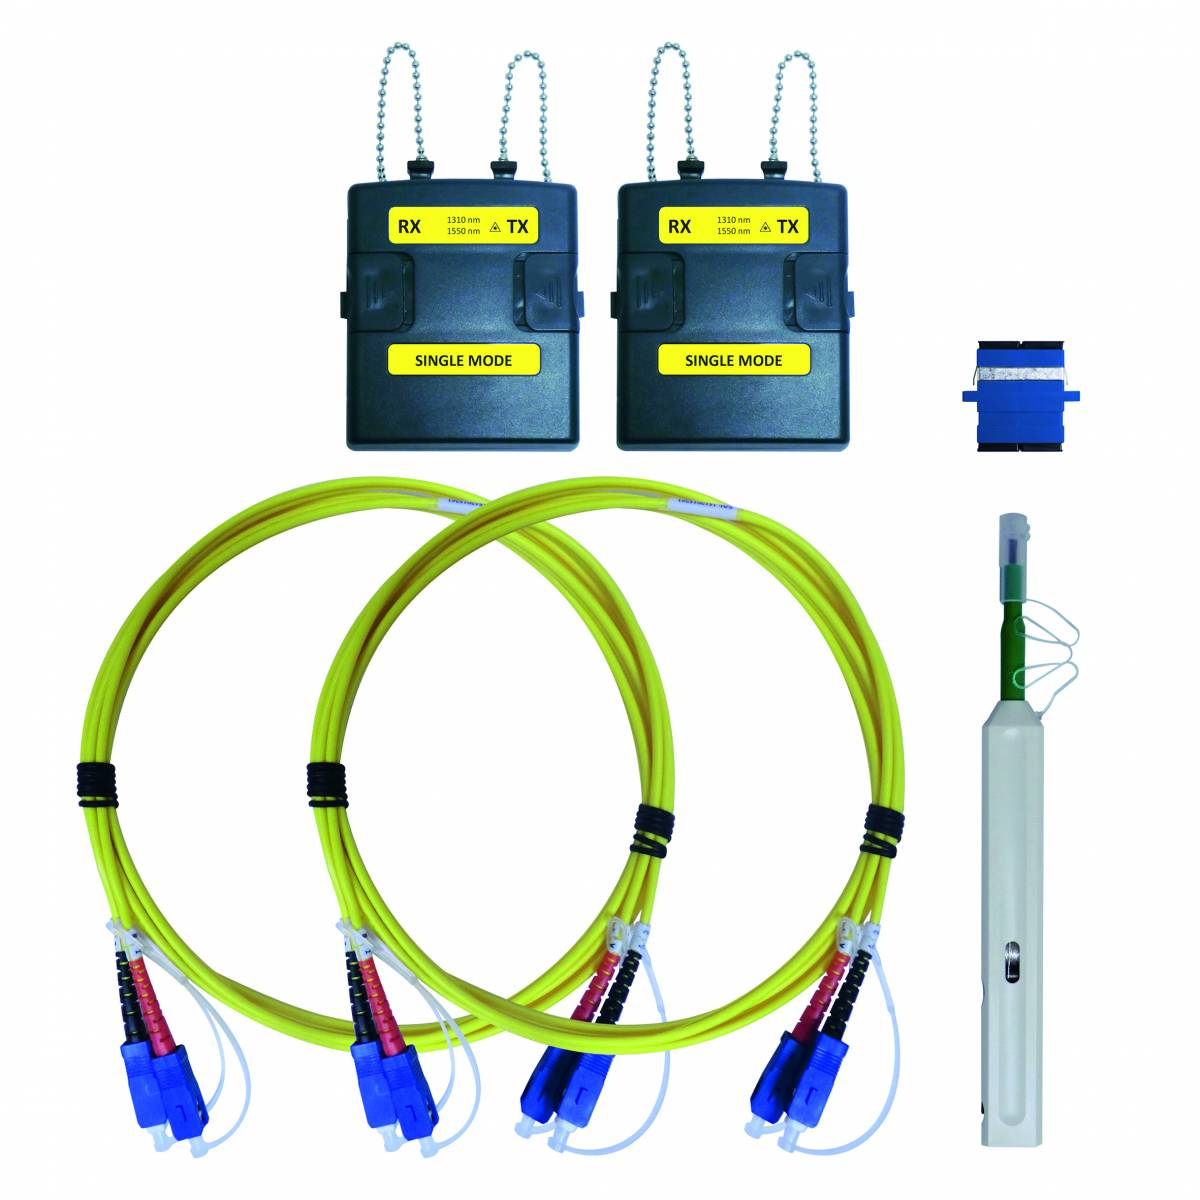 WireXpert - Singlemode adapter, 2 fiber optic adapters